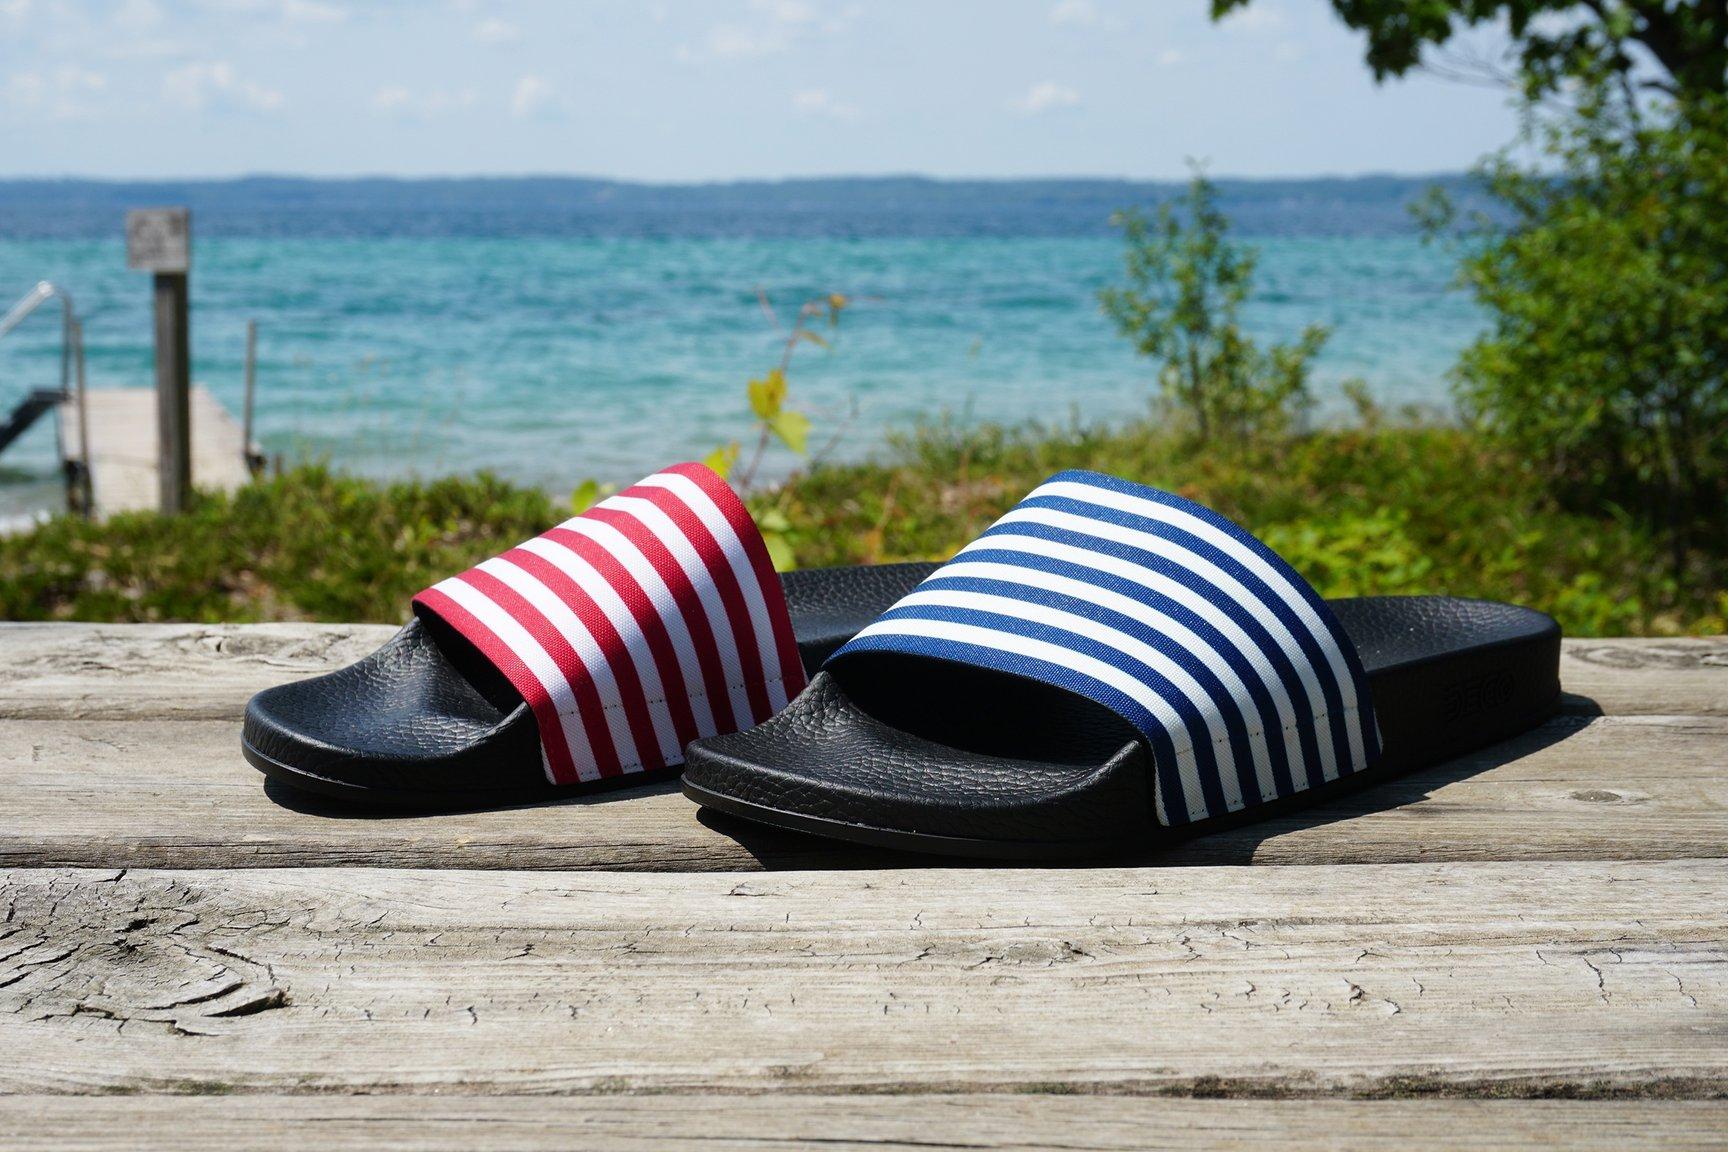 Deco sandal slides